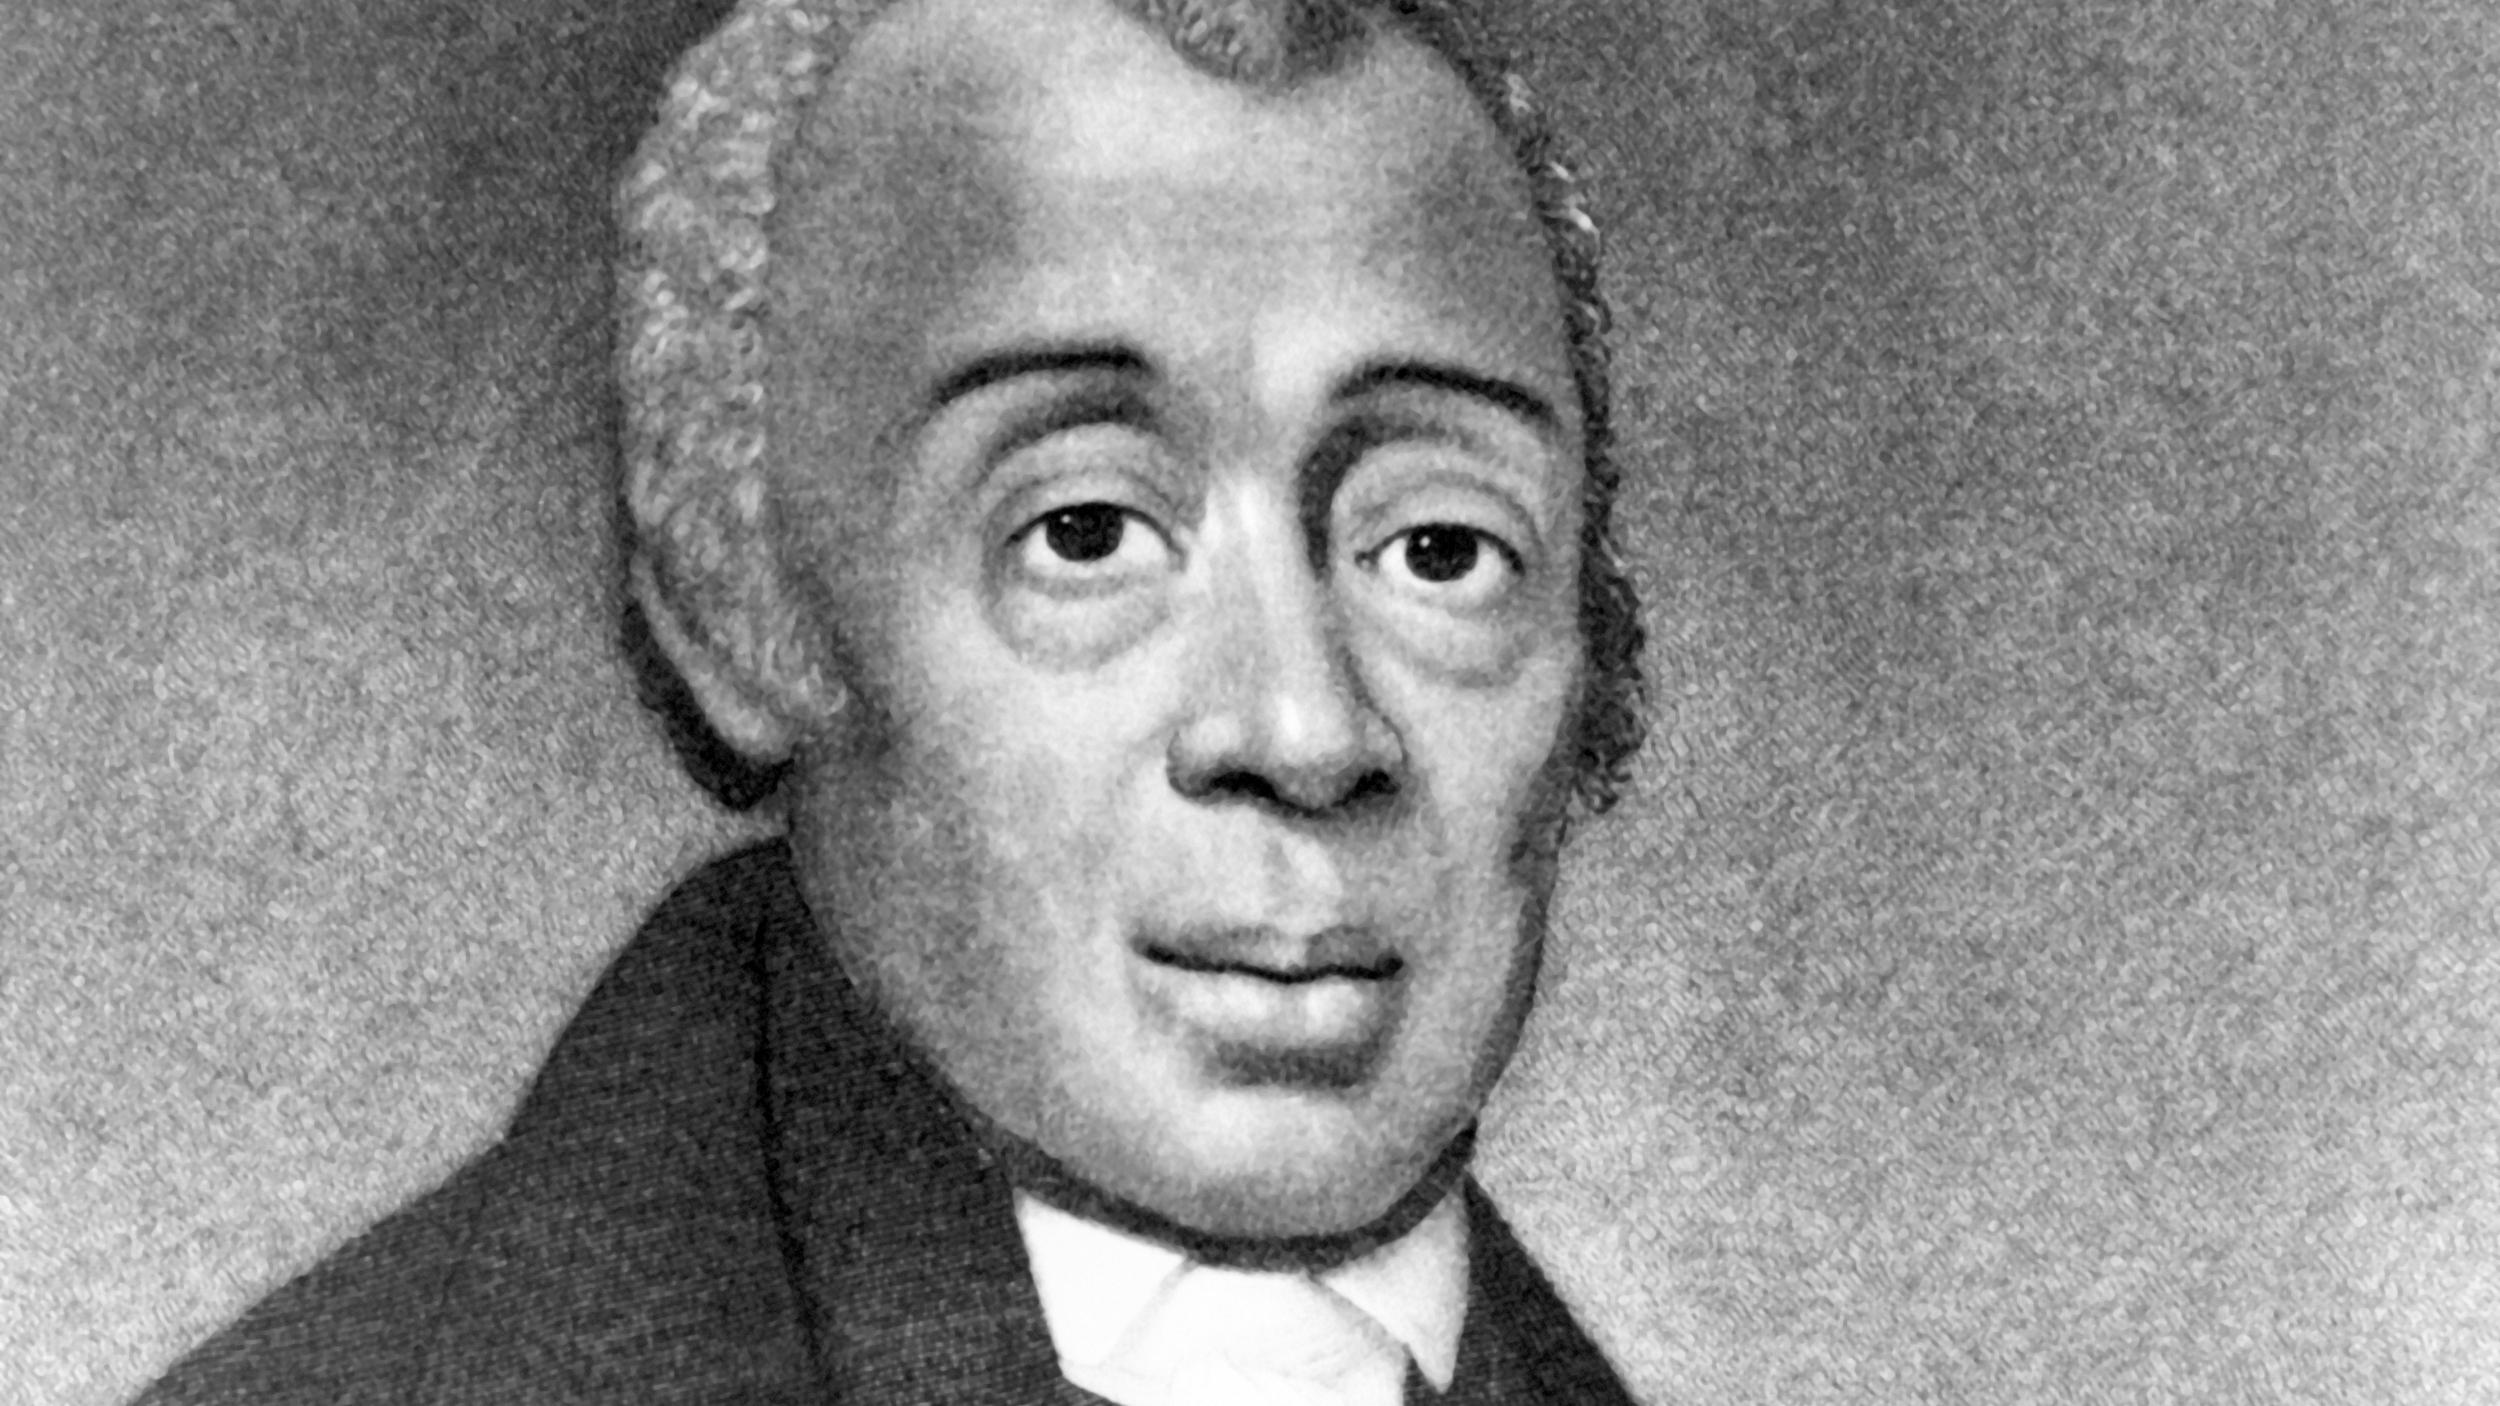 Portrait of Richard Allen